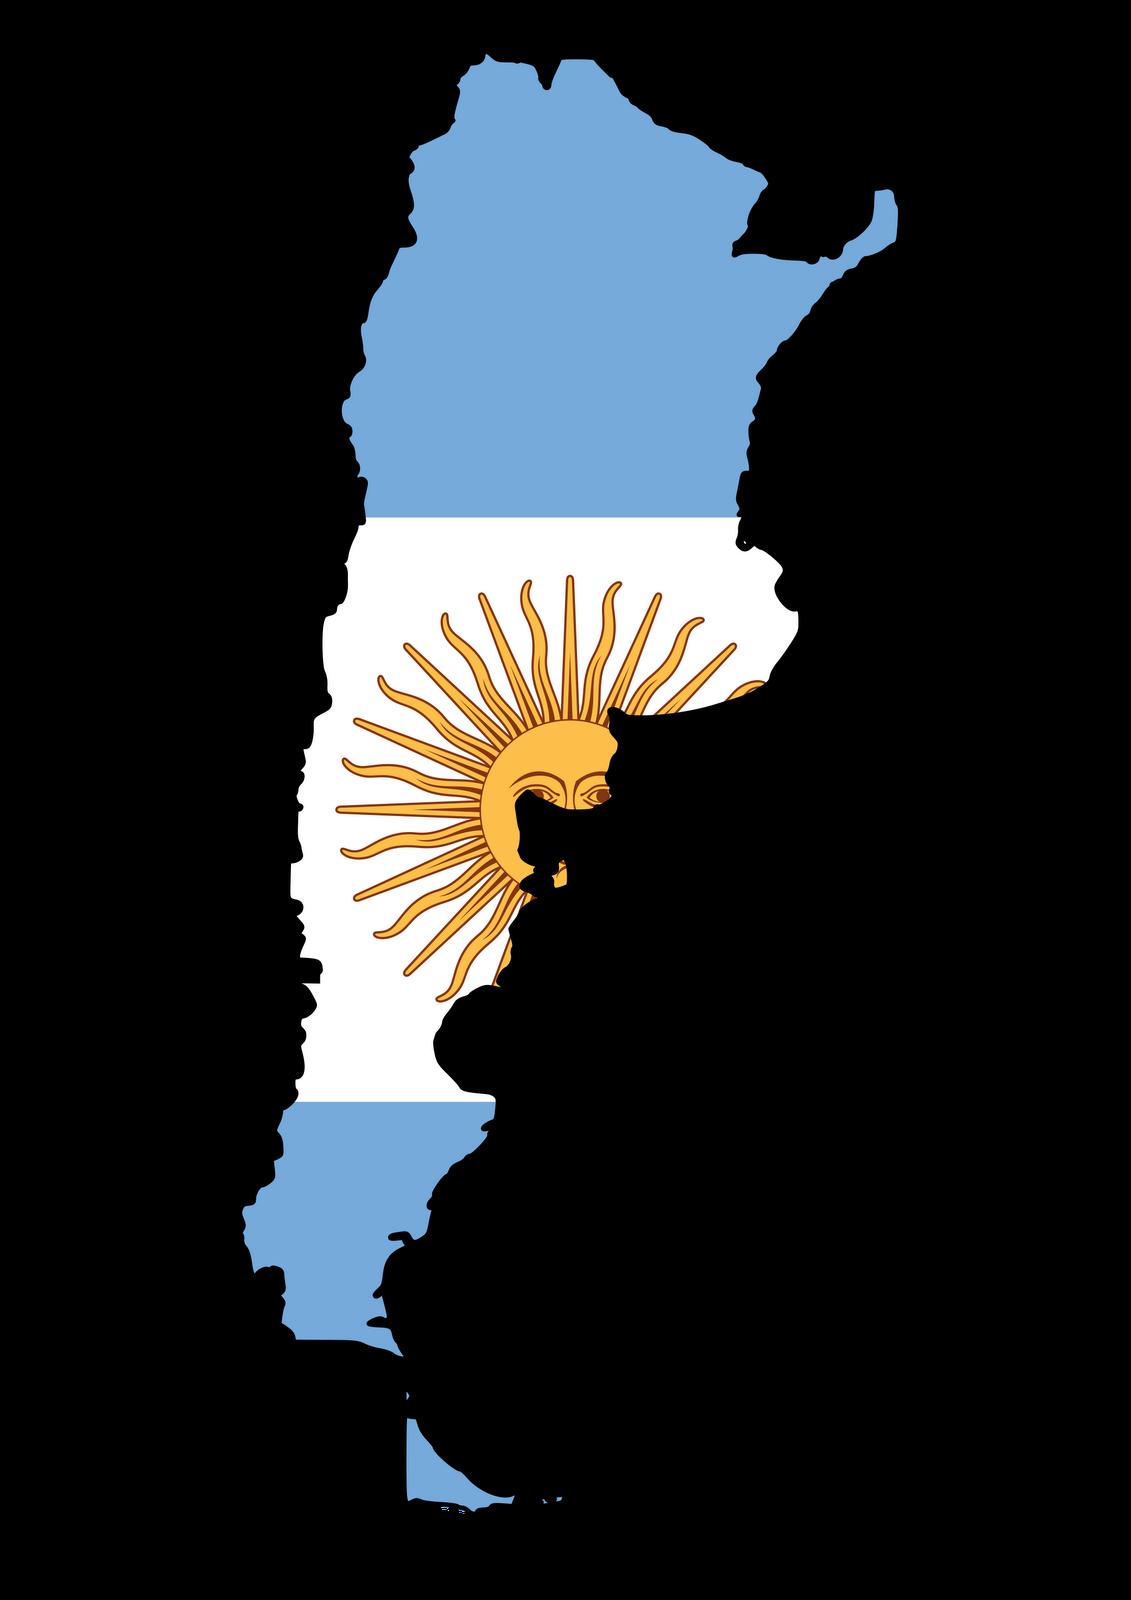 Argentina money clipart vector transparent library Argentina http://3.bp.blogspot.com/-CaZGIqhxYls/Tf6ra6nrR8I ... vector transparent library